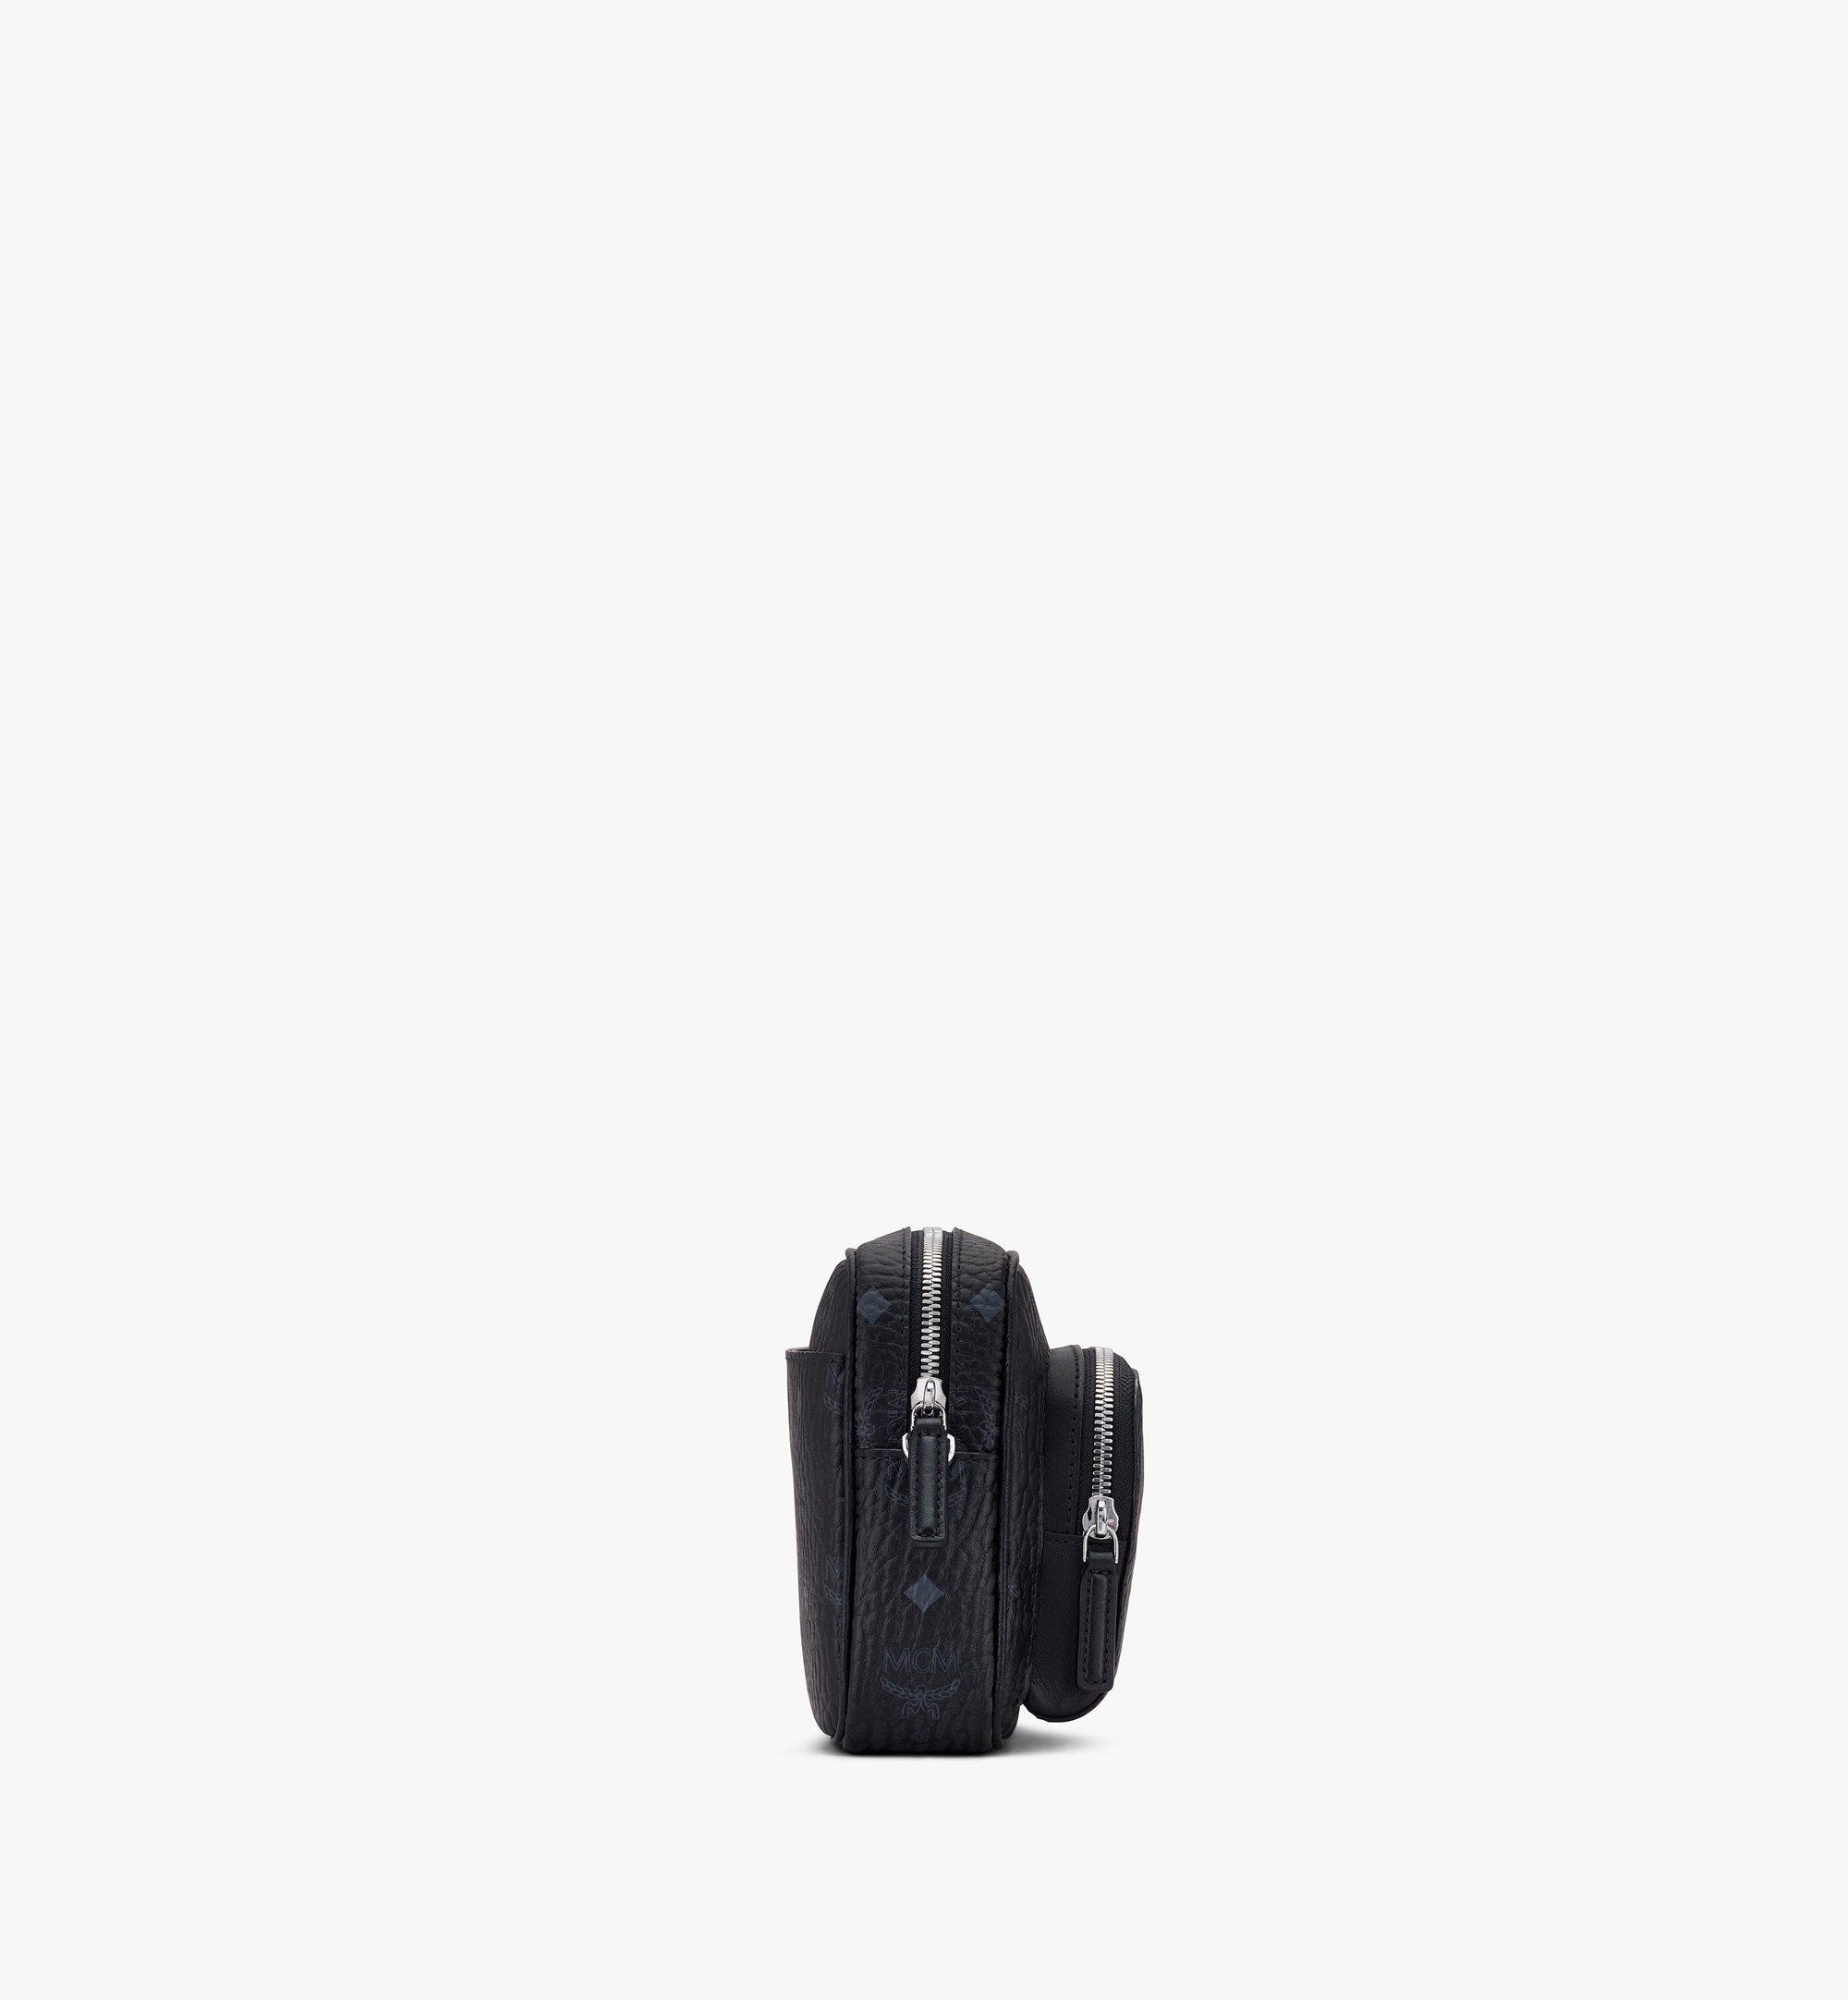 MCM Klassik Crossbody-Tasche in Visetos Black MMRASKC06BK001 Alternate View 2